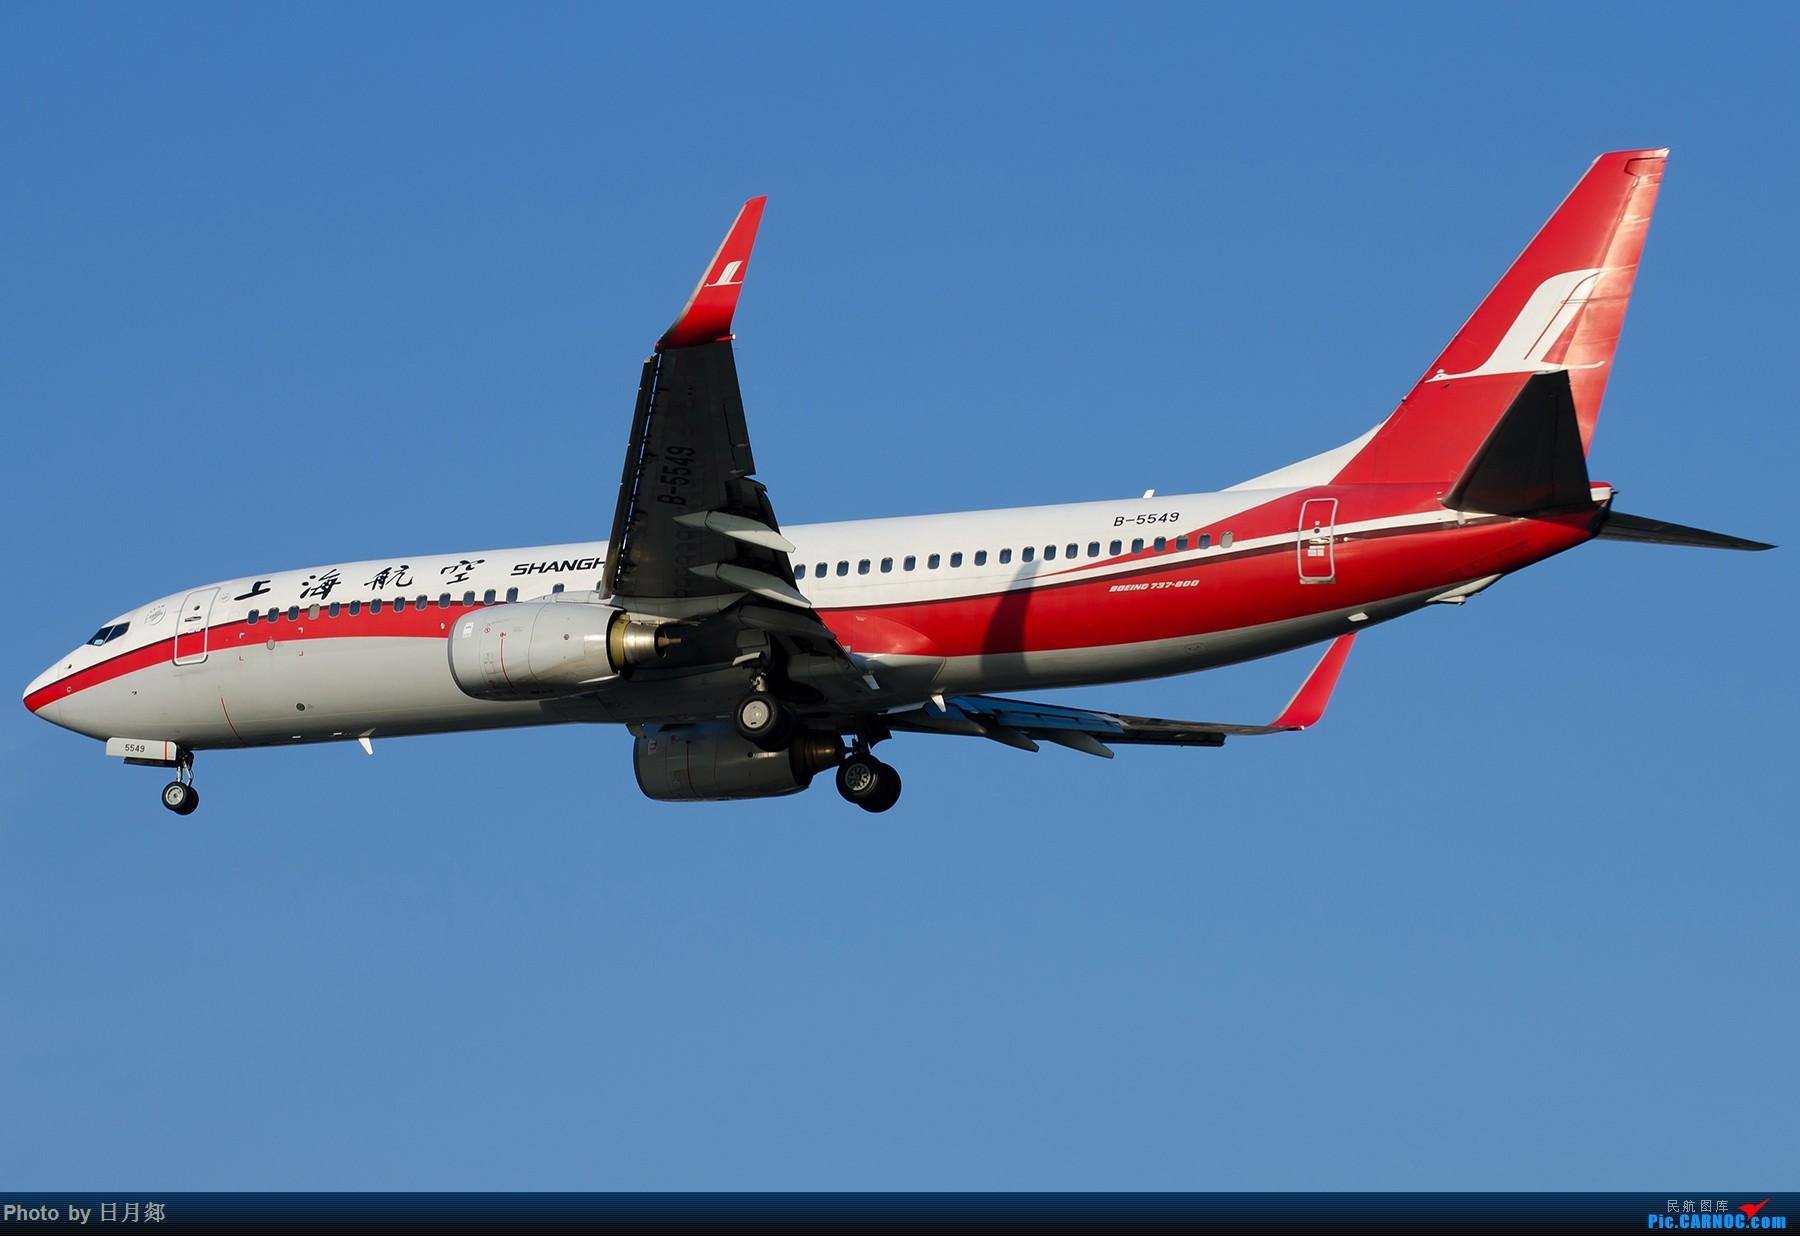 Re:[原创]【SHA拍机*1800大图】轻度污染来临前宝贵的蓝天,且拍且珍惜 BOEING 737-800 B-5549 中国上海虹桥国际机场